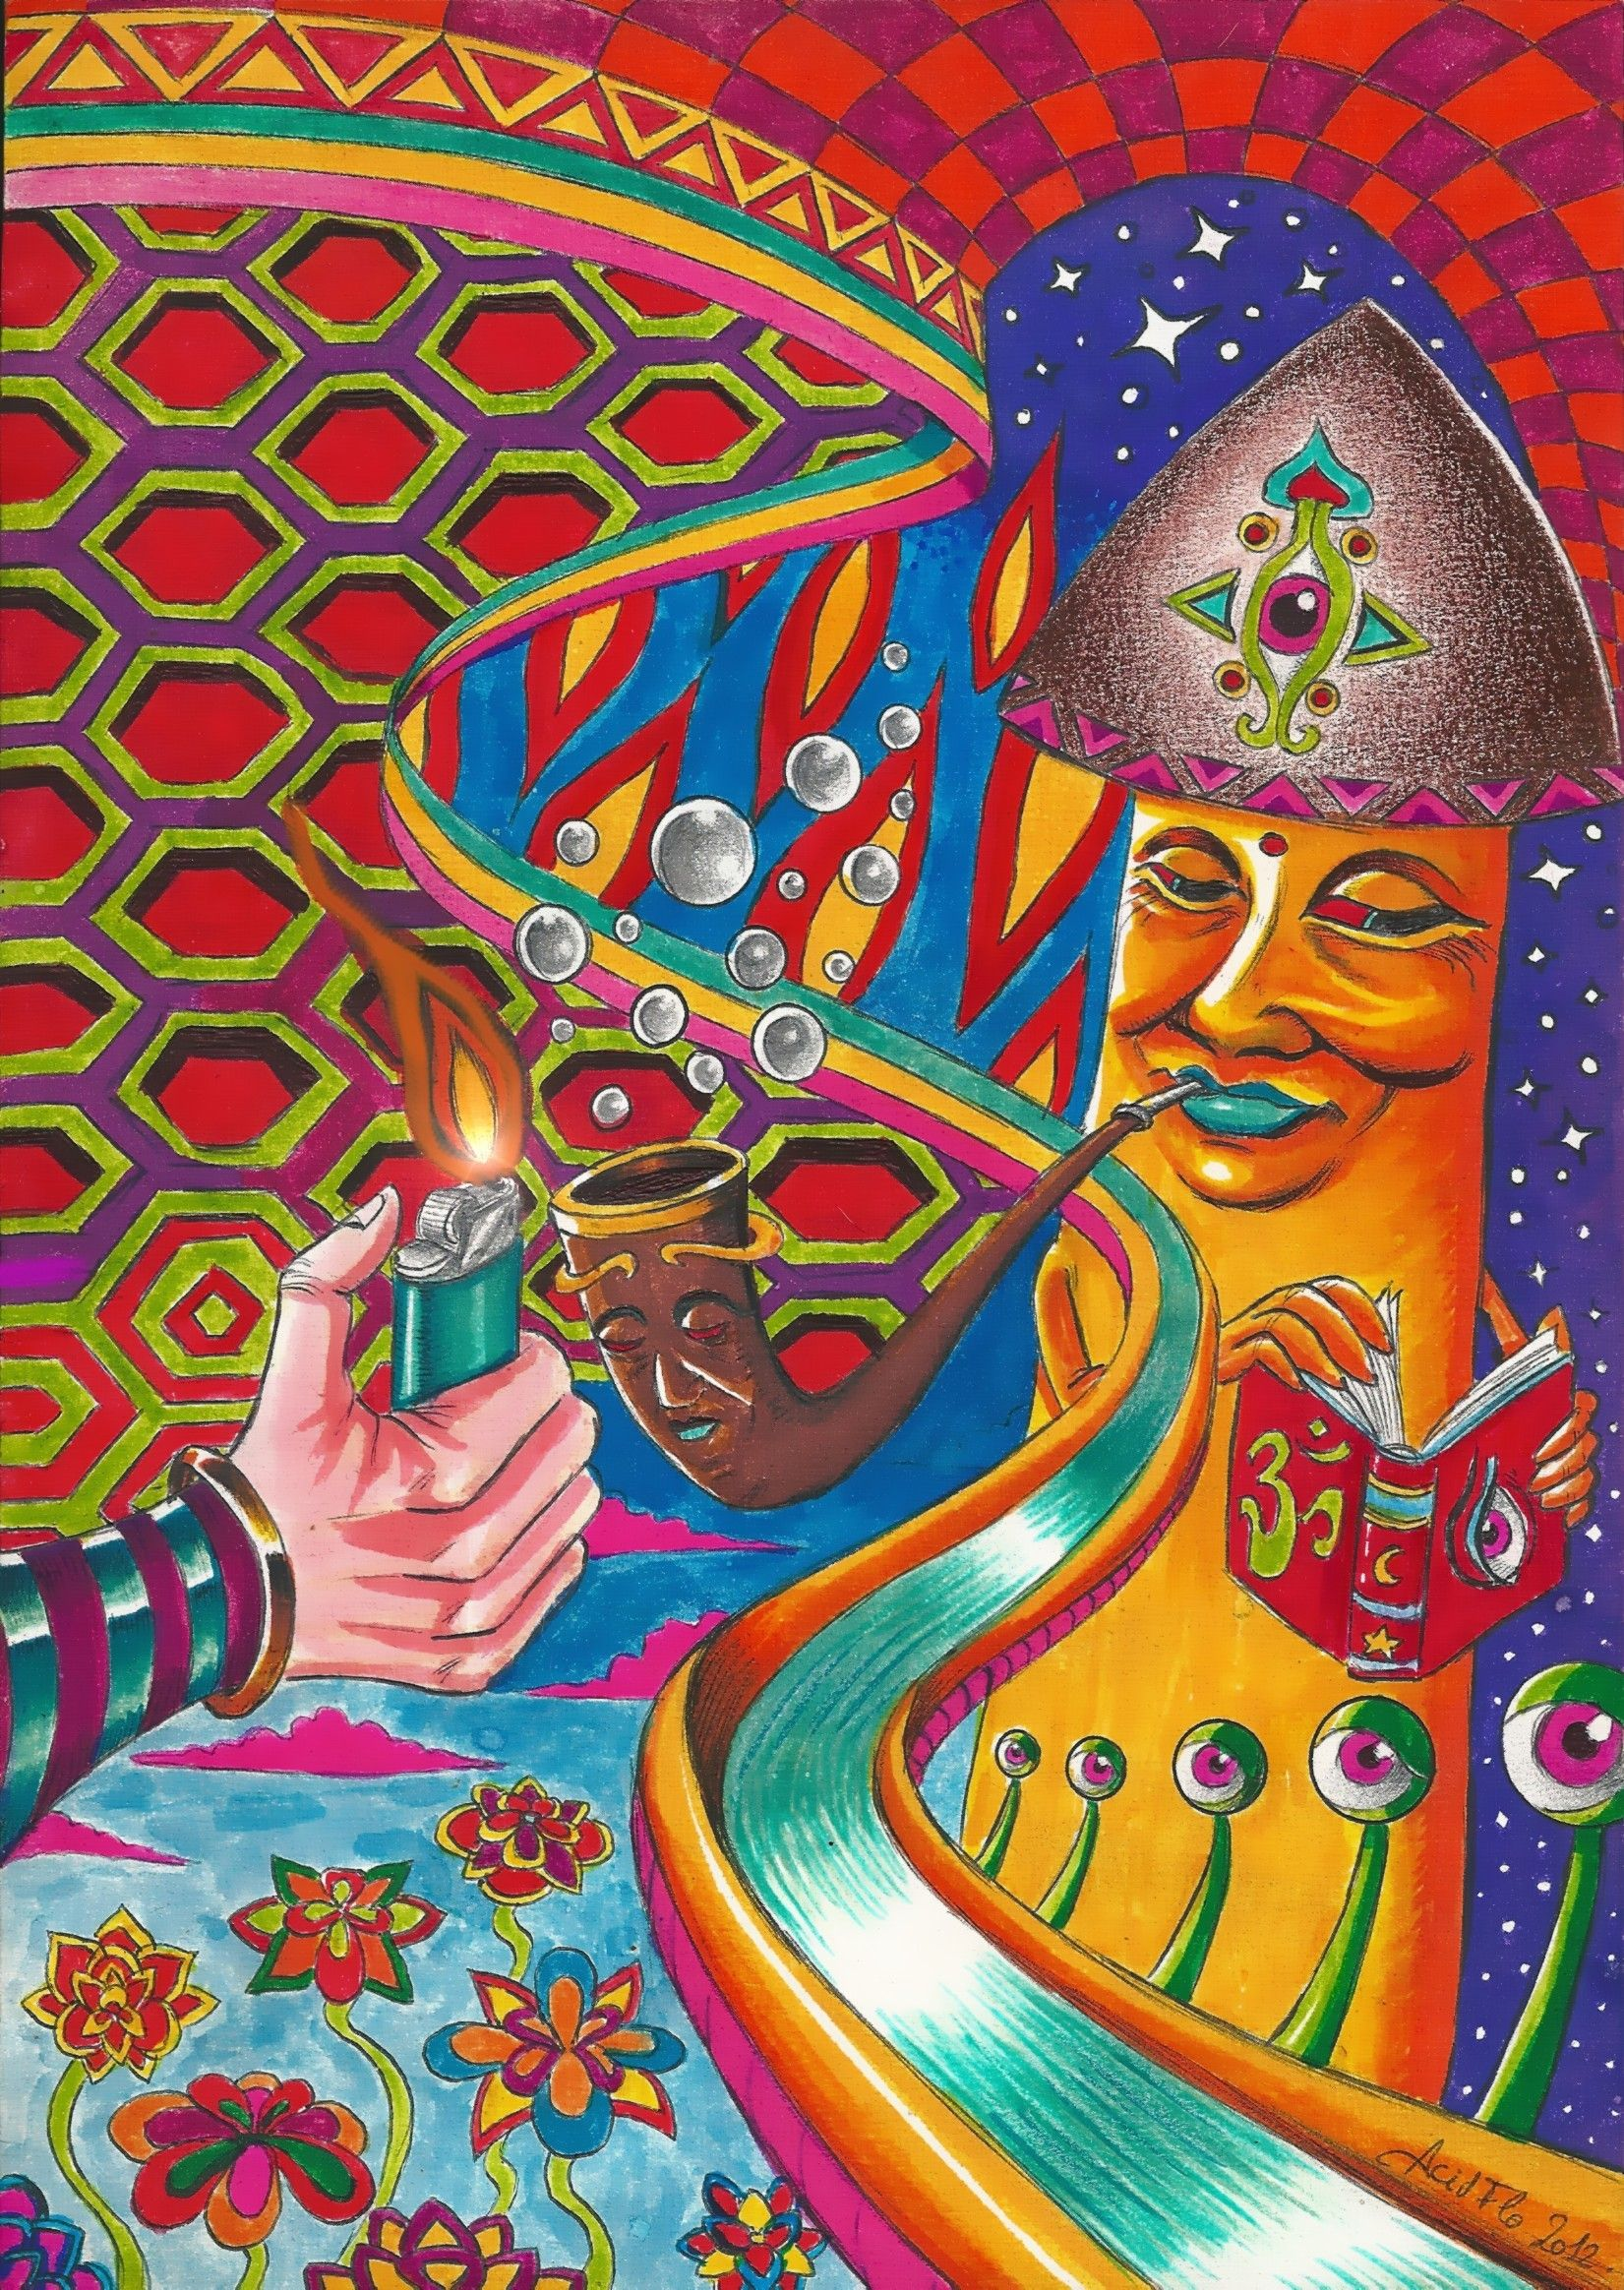 Acid Phone Wallpapers Top Free Acid Phone Backgrounds